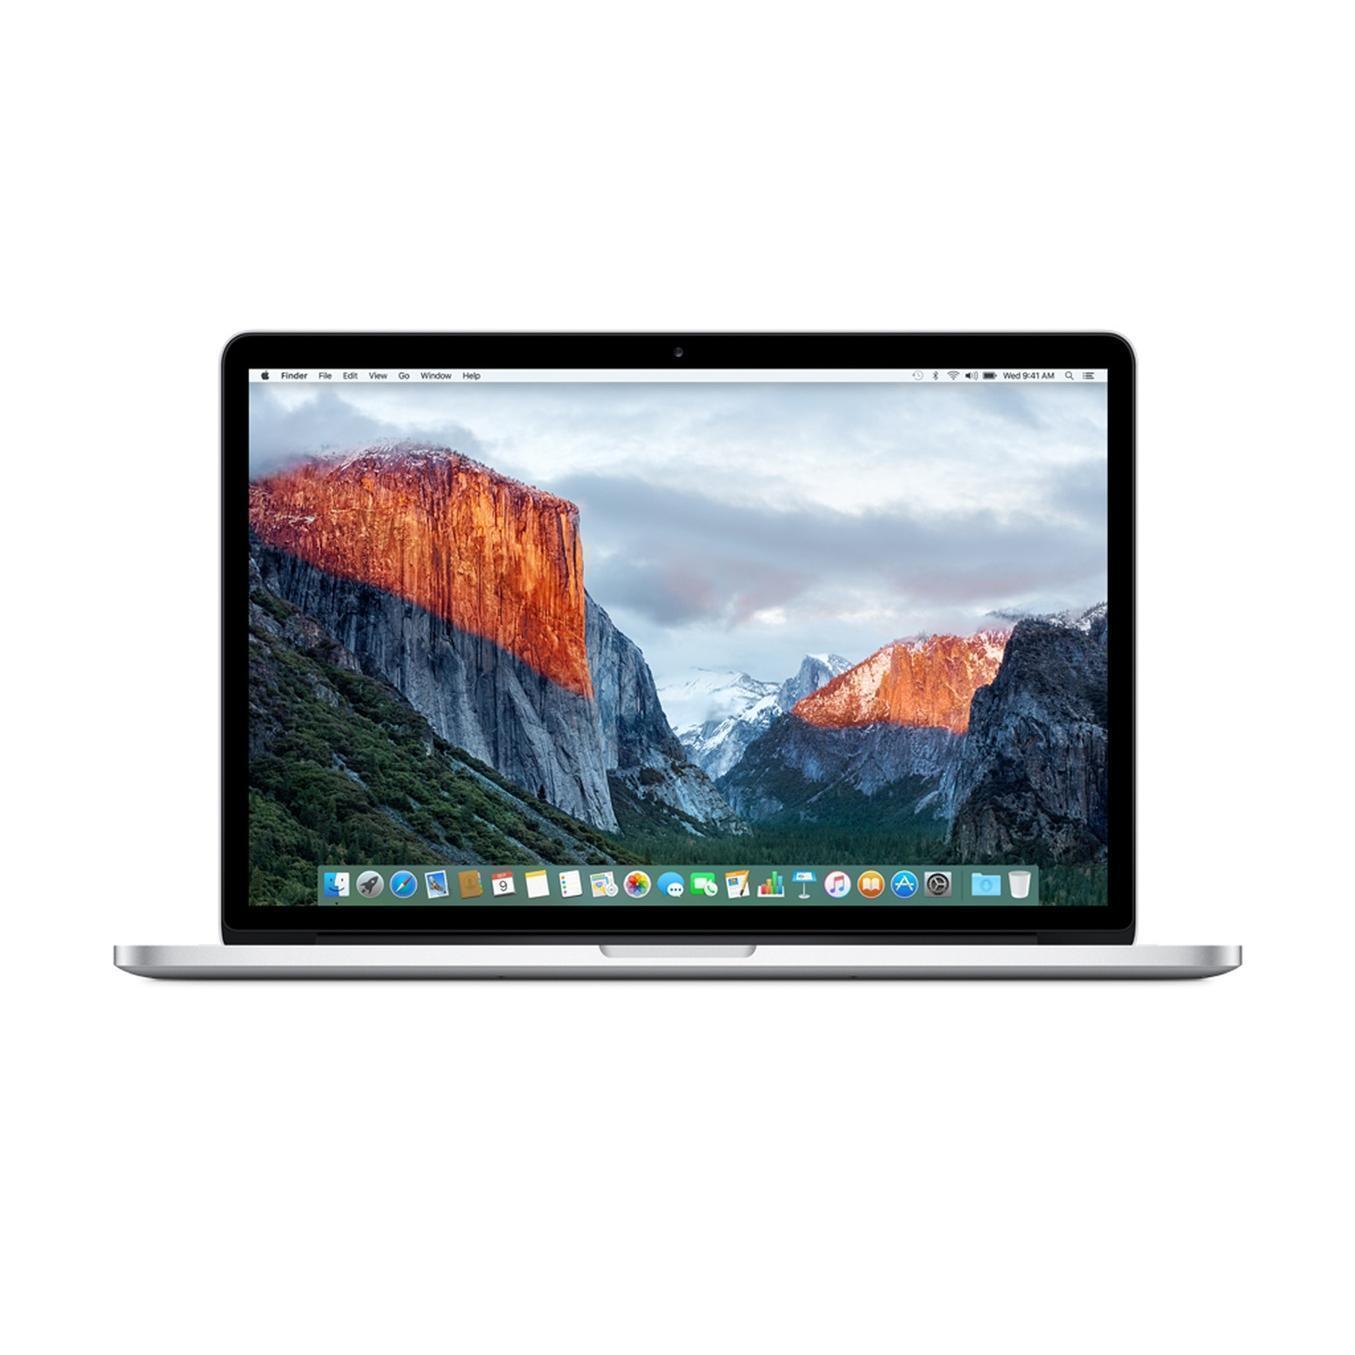 MacBook Pro Retina 15.4-inch (2014) - Core i7 - 16GB - SSD 256 GB QWERTY